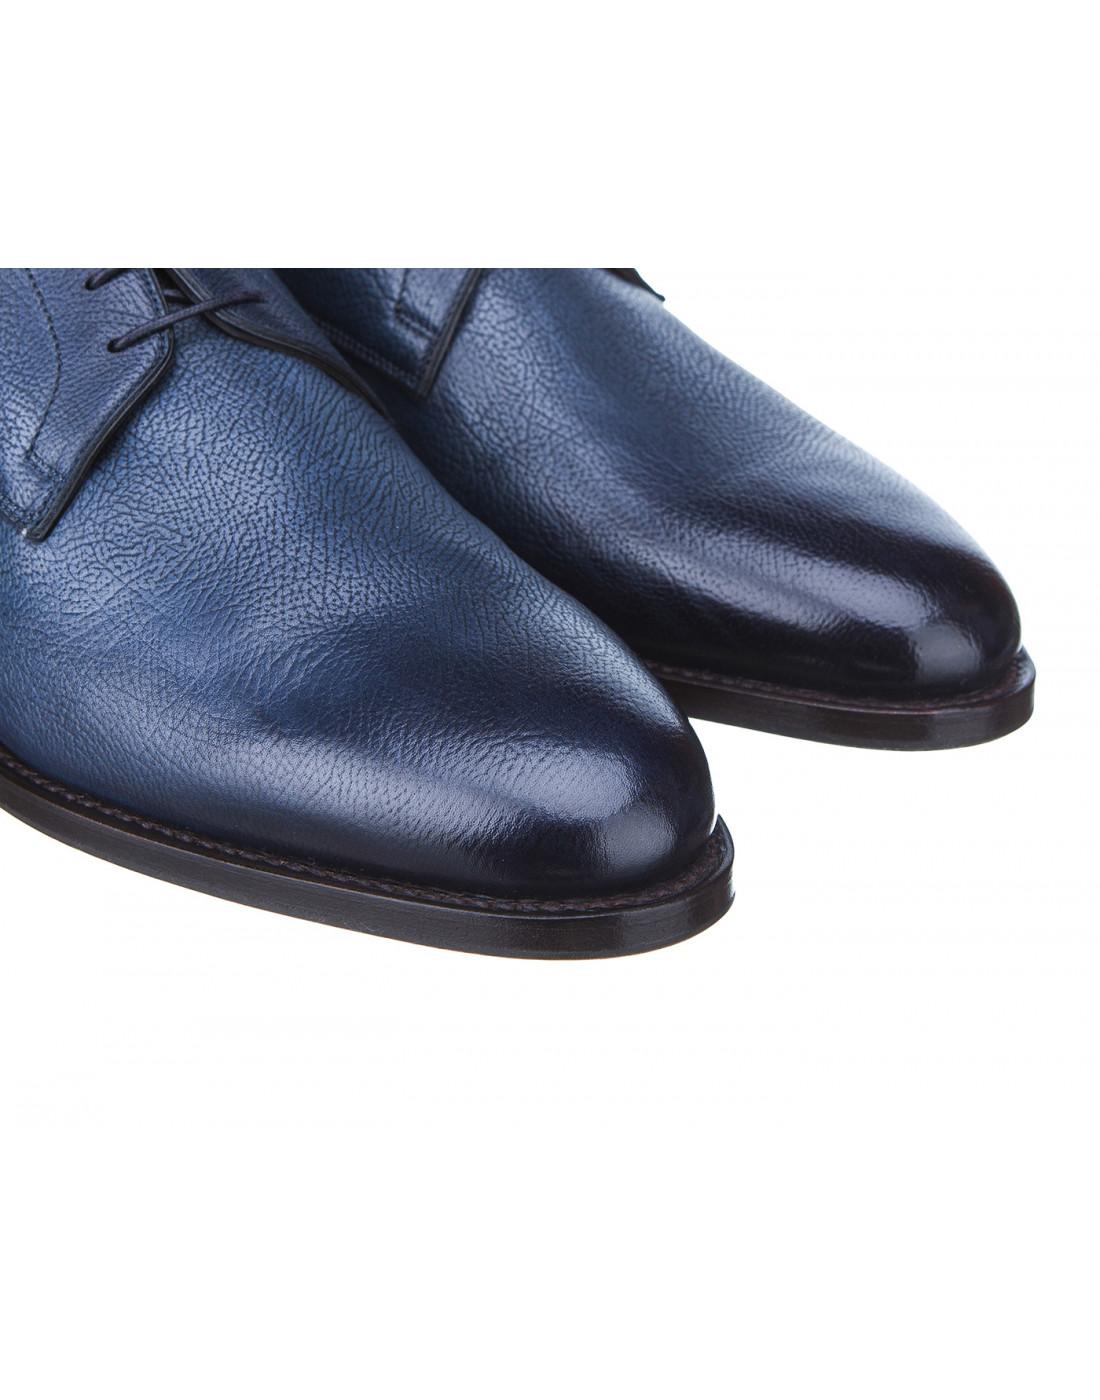 Туфли синие мужские Santoni S14303-4